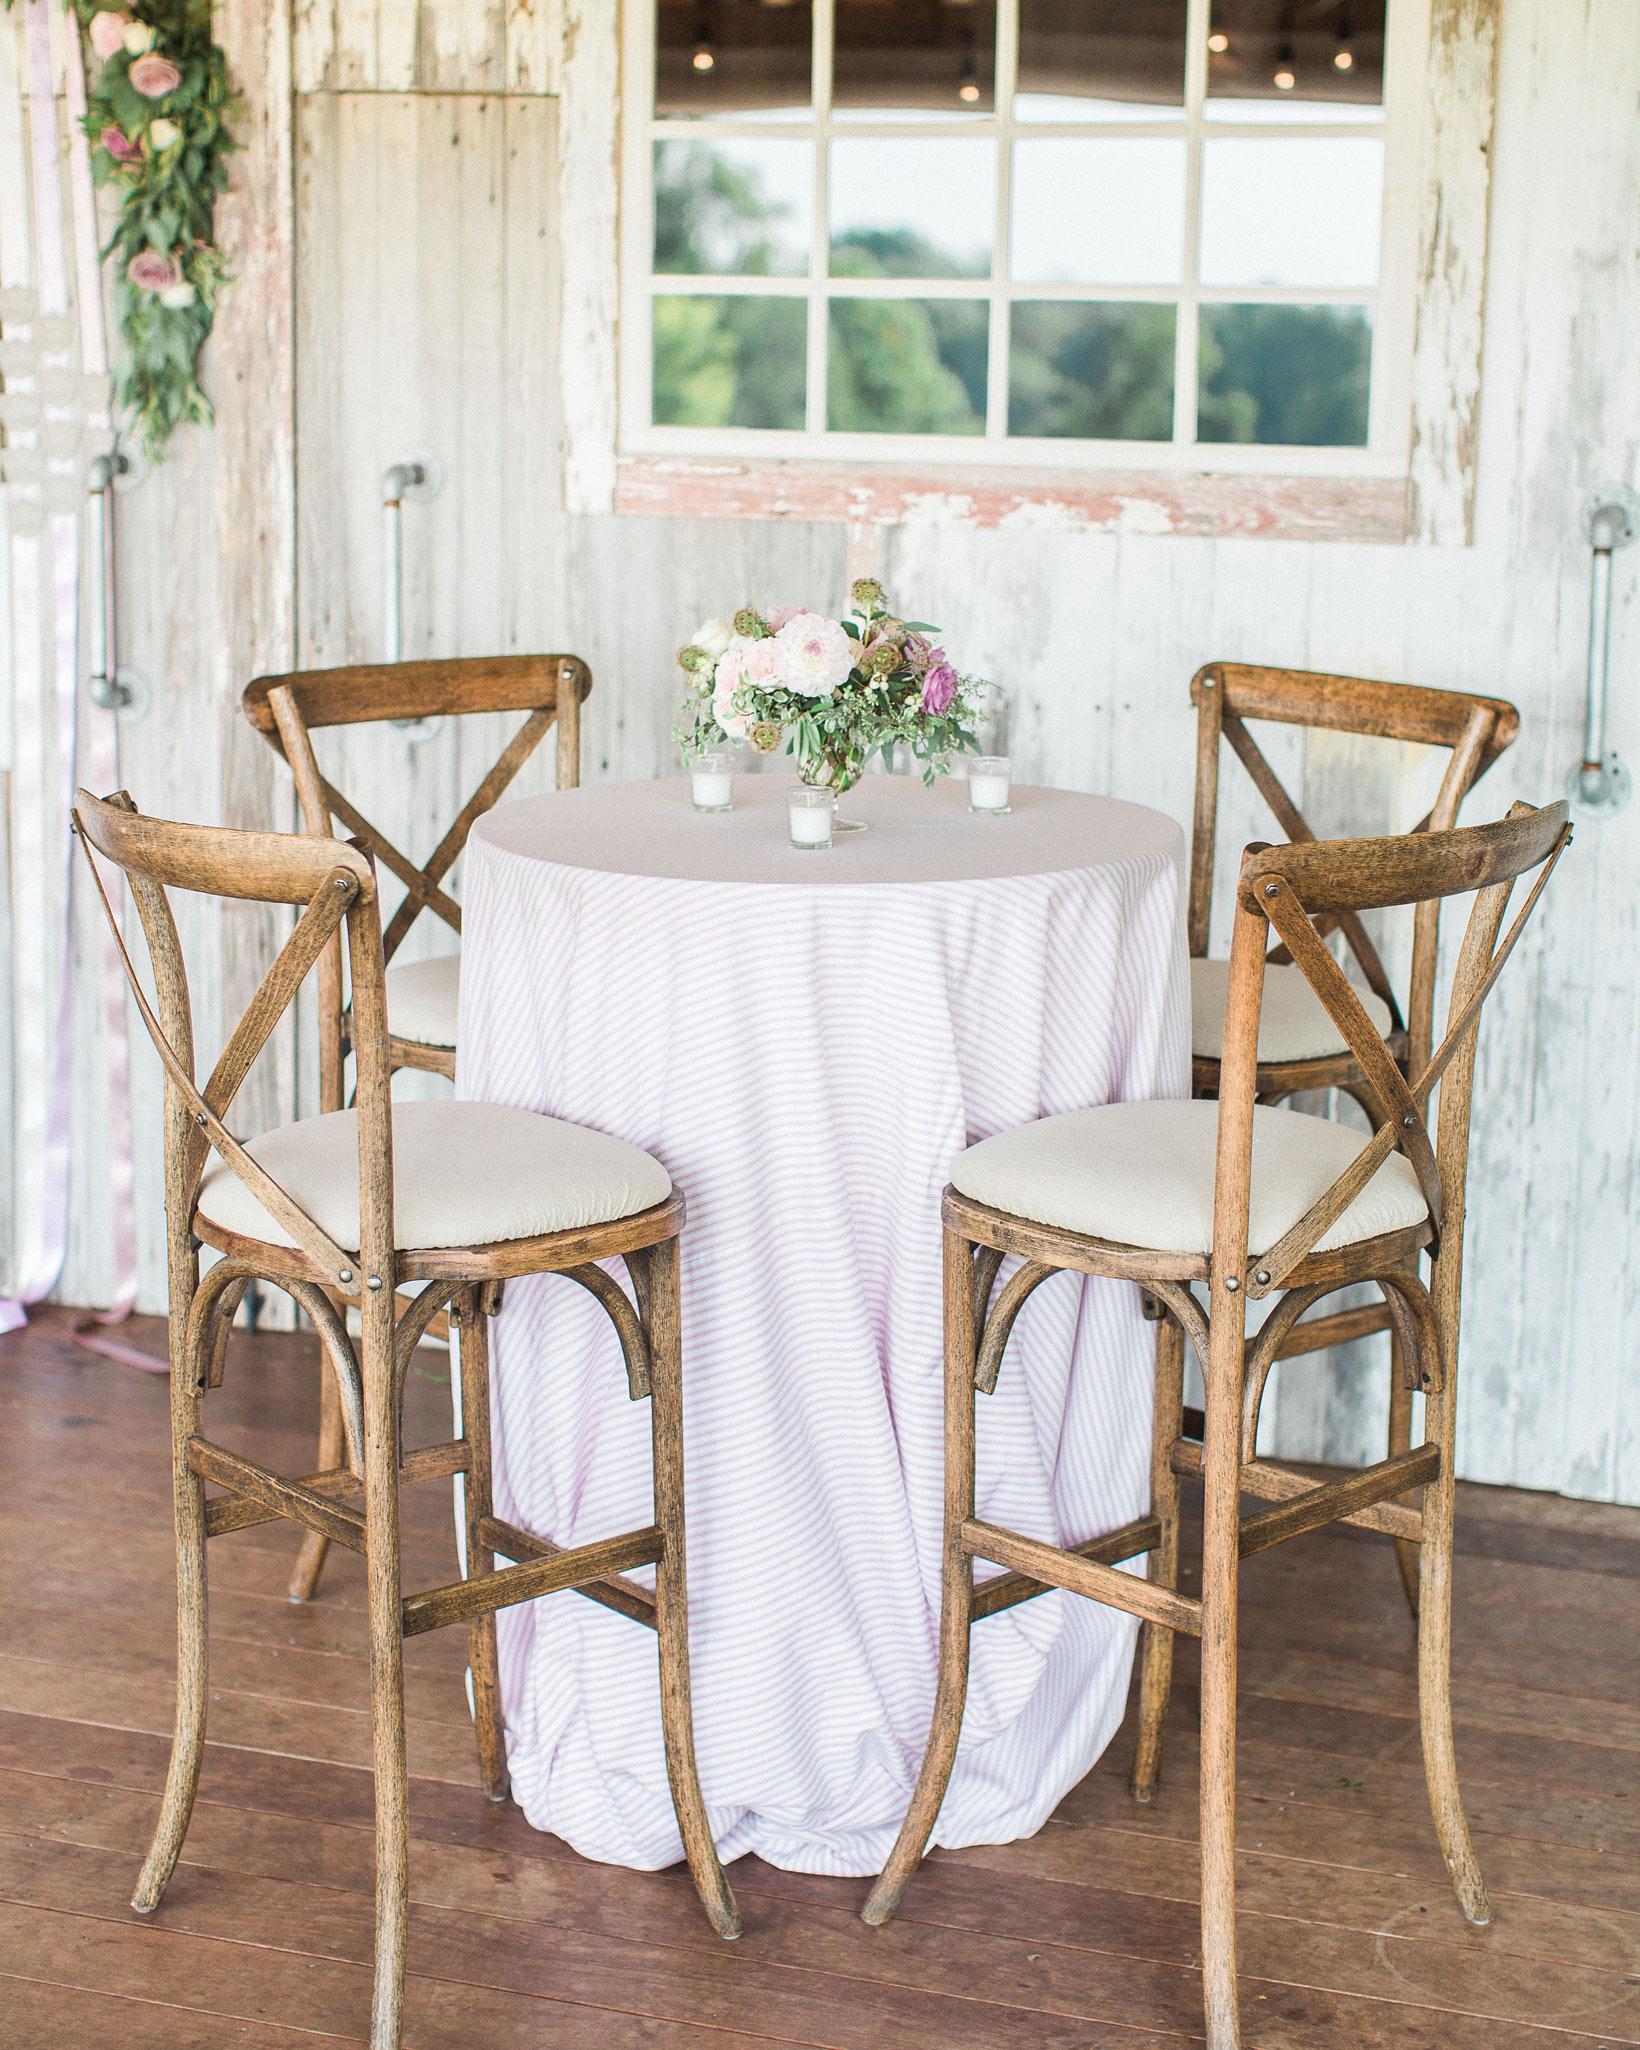 sarah-michael-wedding-cocktailtable-751-s112783-0416.jpg